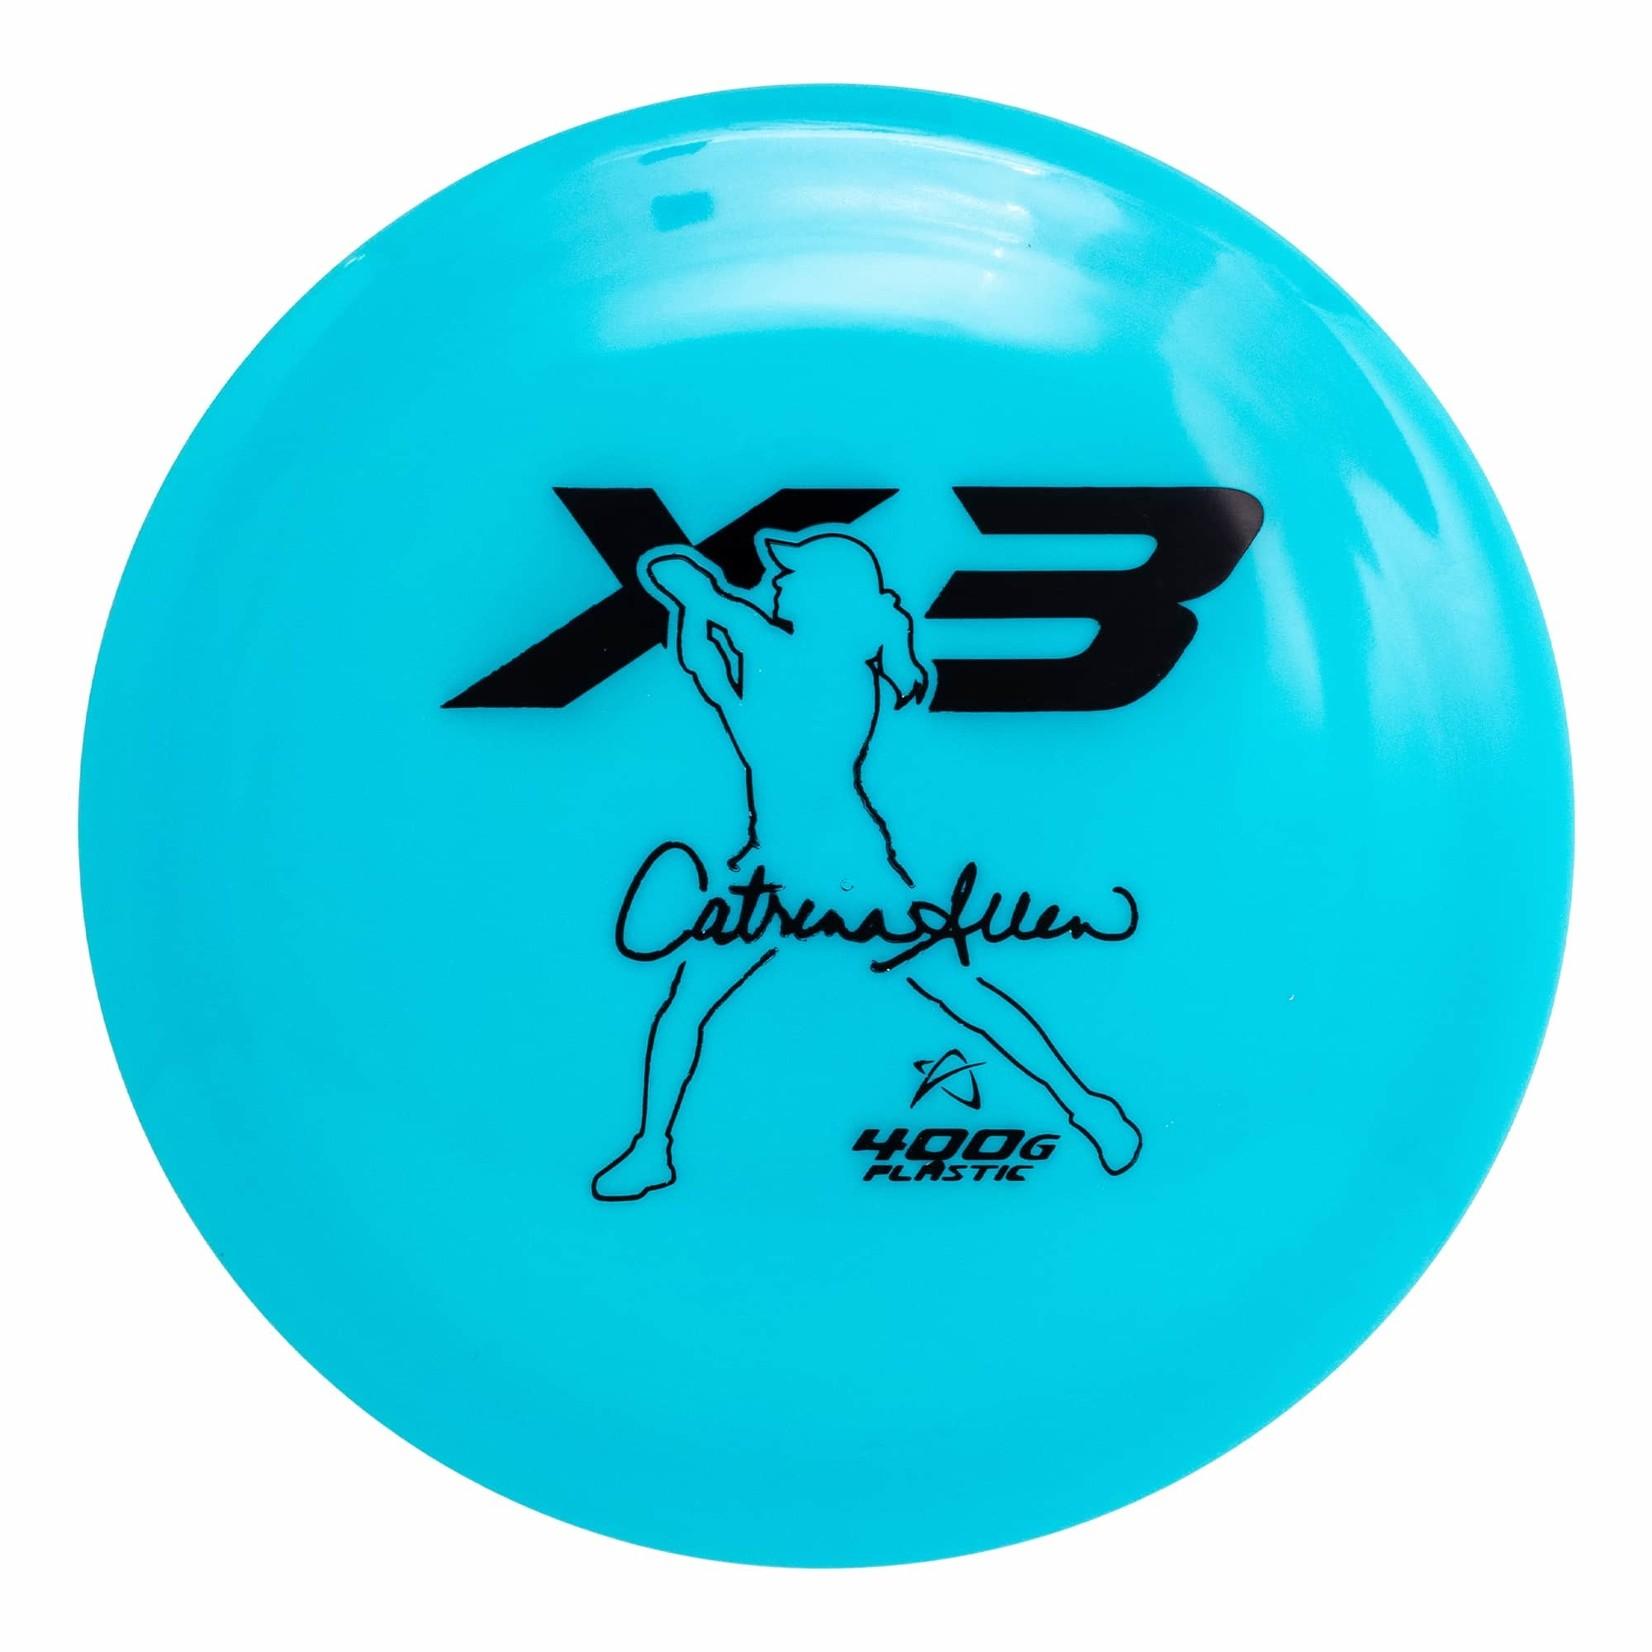 Prodigy Prodigy Disc, X3 400G Catrina Allen Signature Series, X3-400G-SIG-CA-174